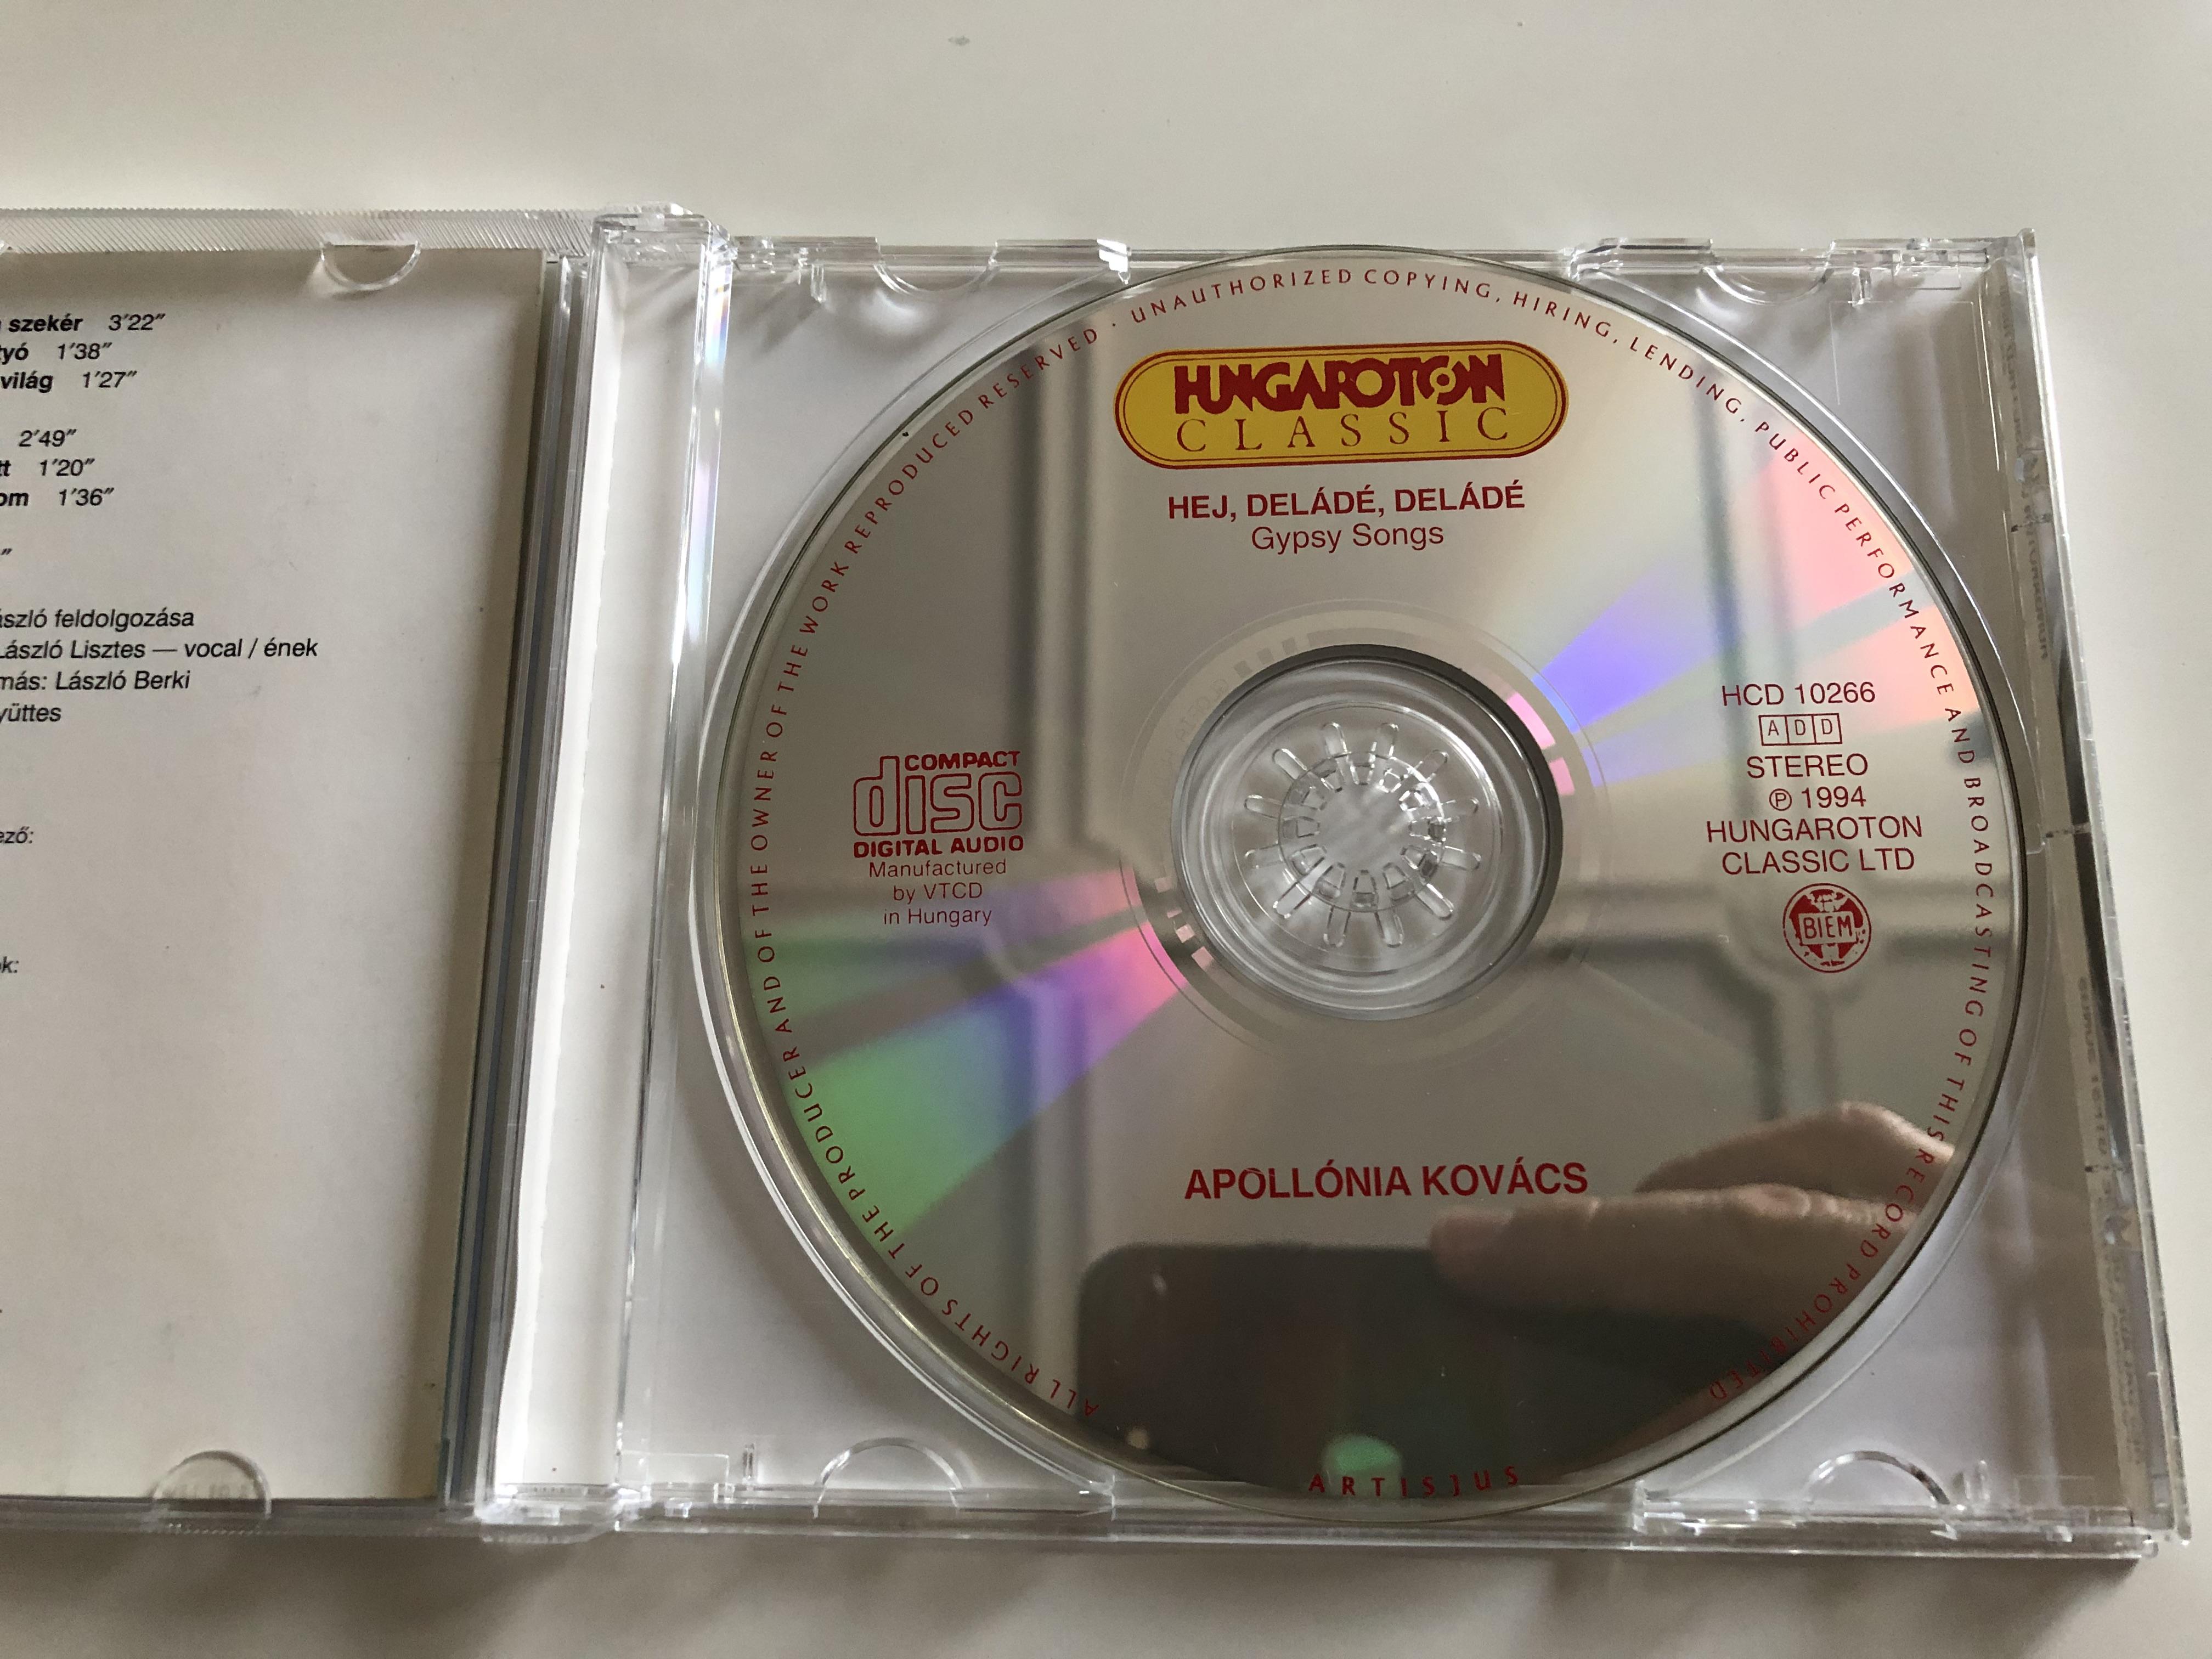 apoll-nia-kov-cs-hej-dal-d-del-d-gypsy-songs-cig-nydalok-hungaroton-classic-audio-cd-1994-hcd-10266-5-.jpg